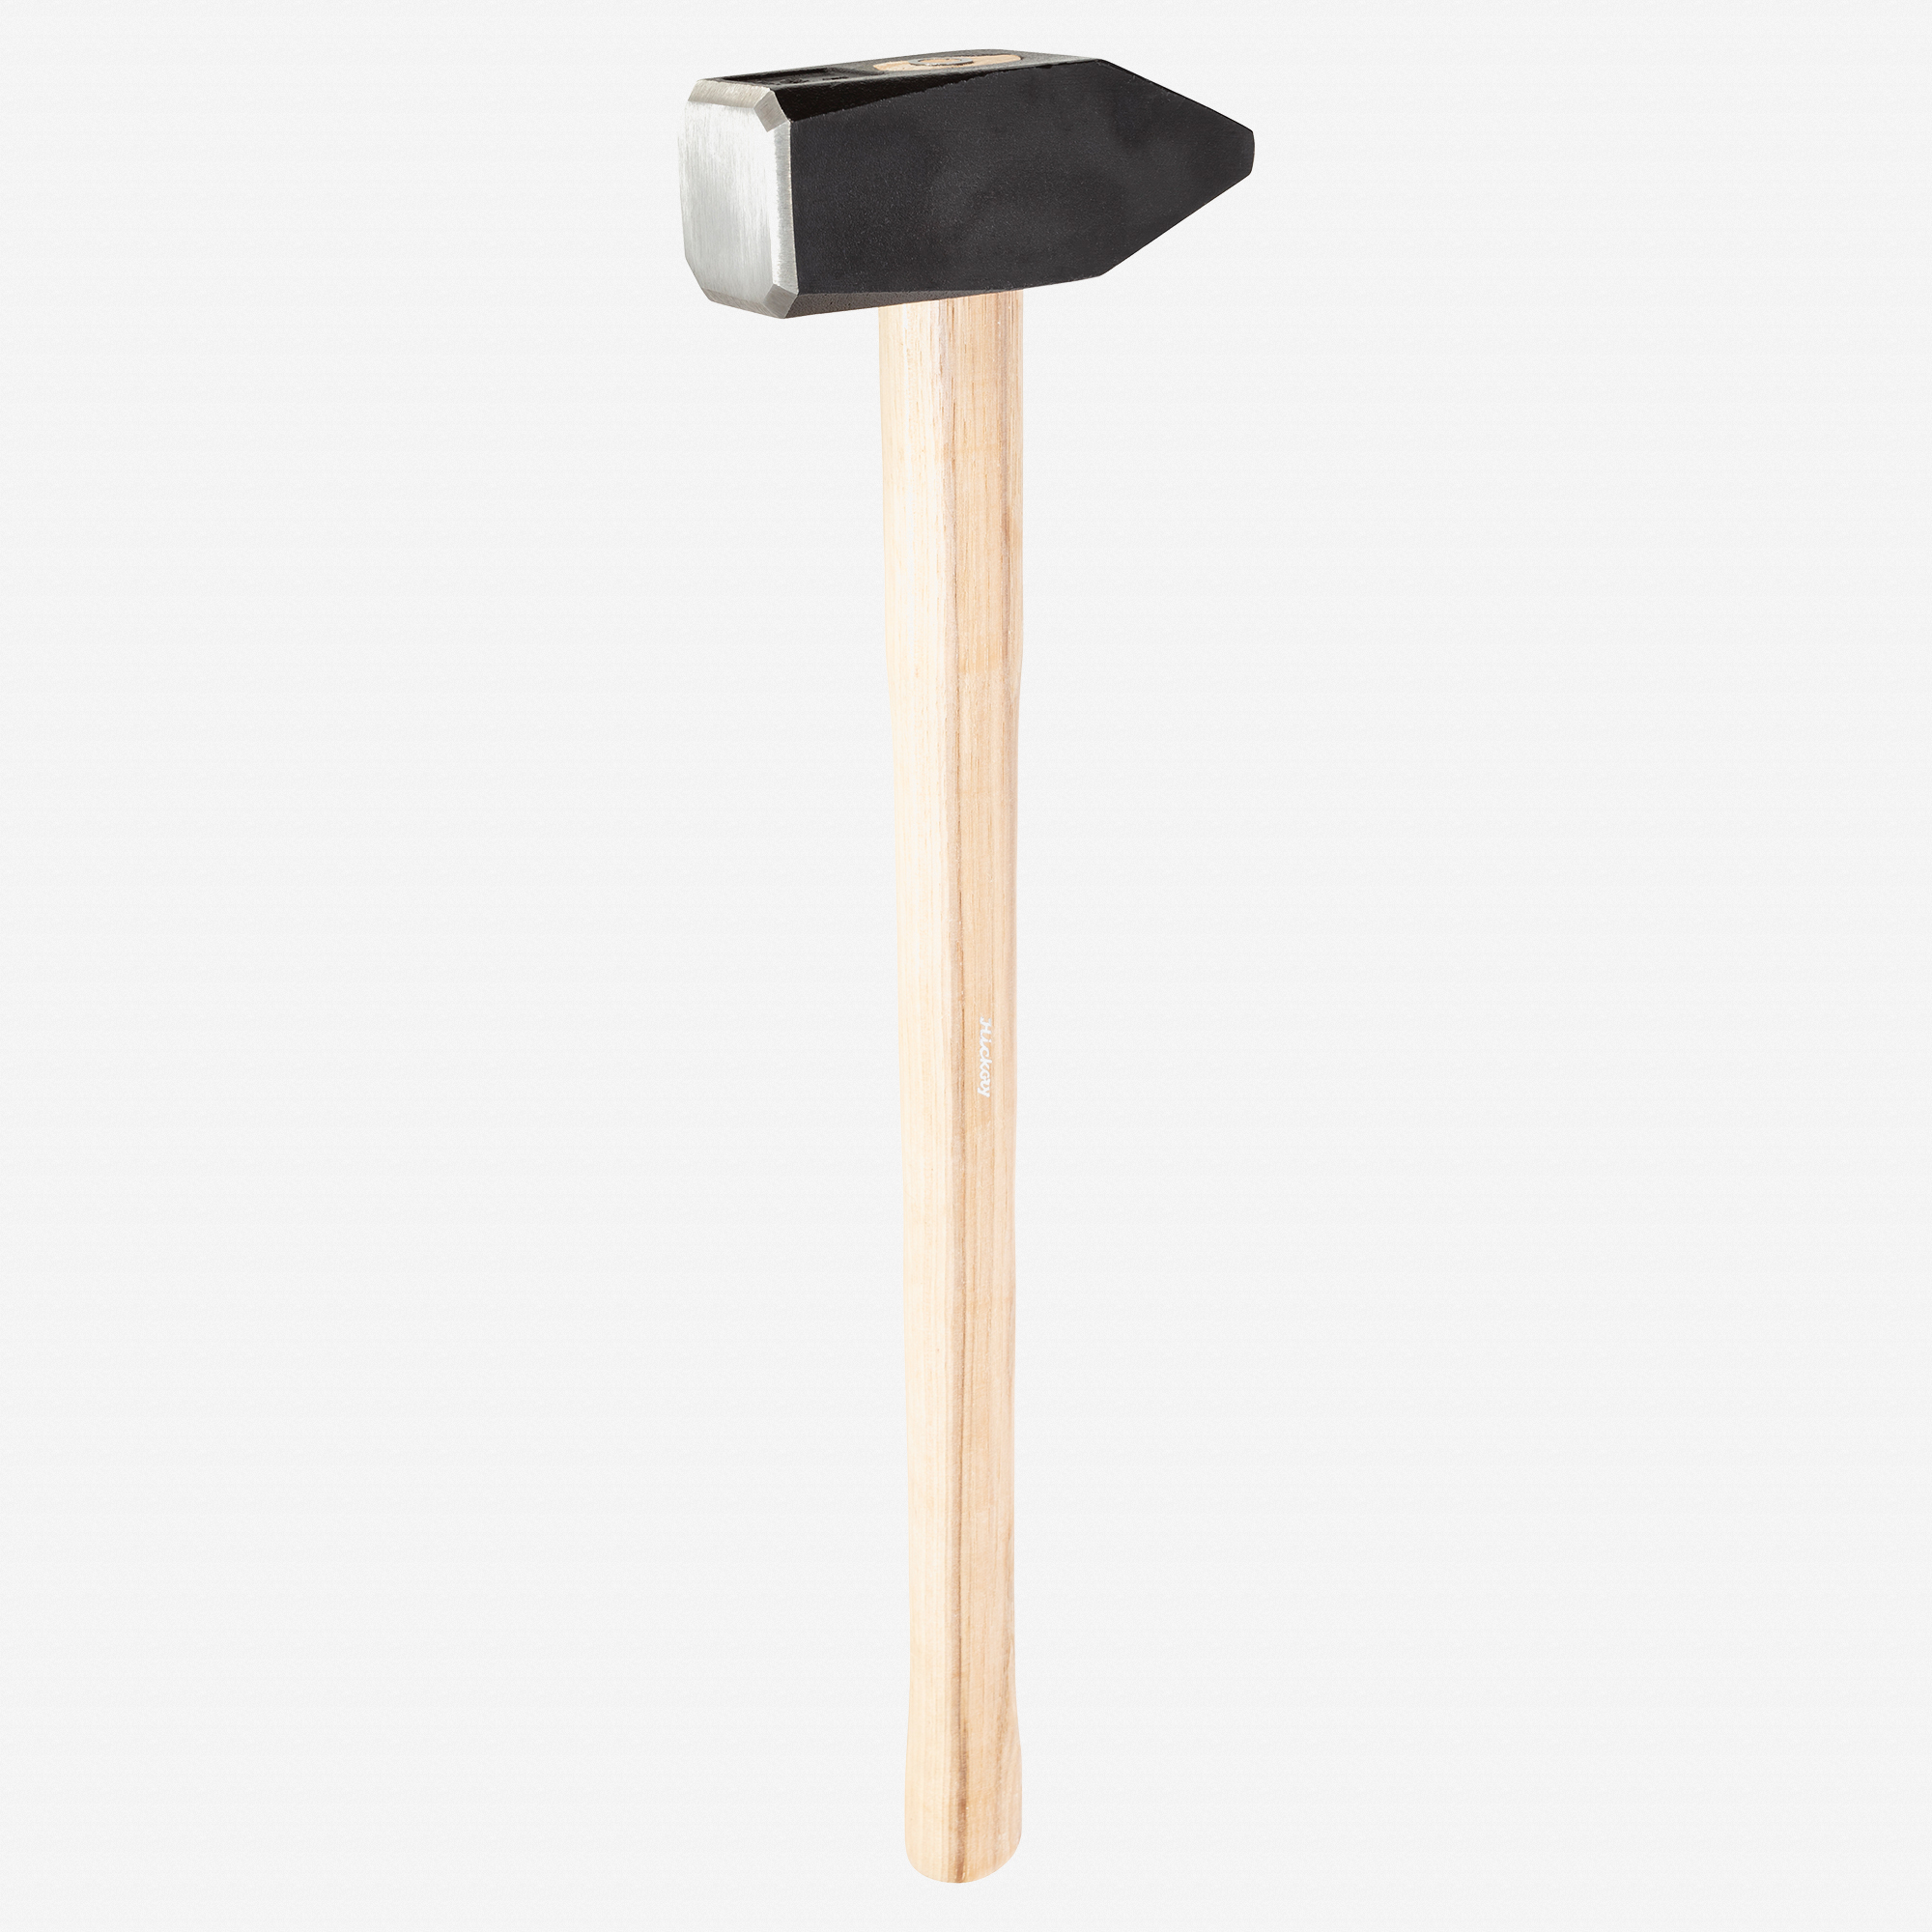 Picard 13 lb Slegde Hammer, cross peen - KC Tool